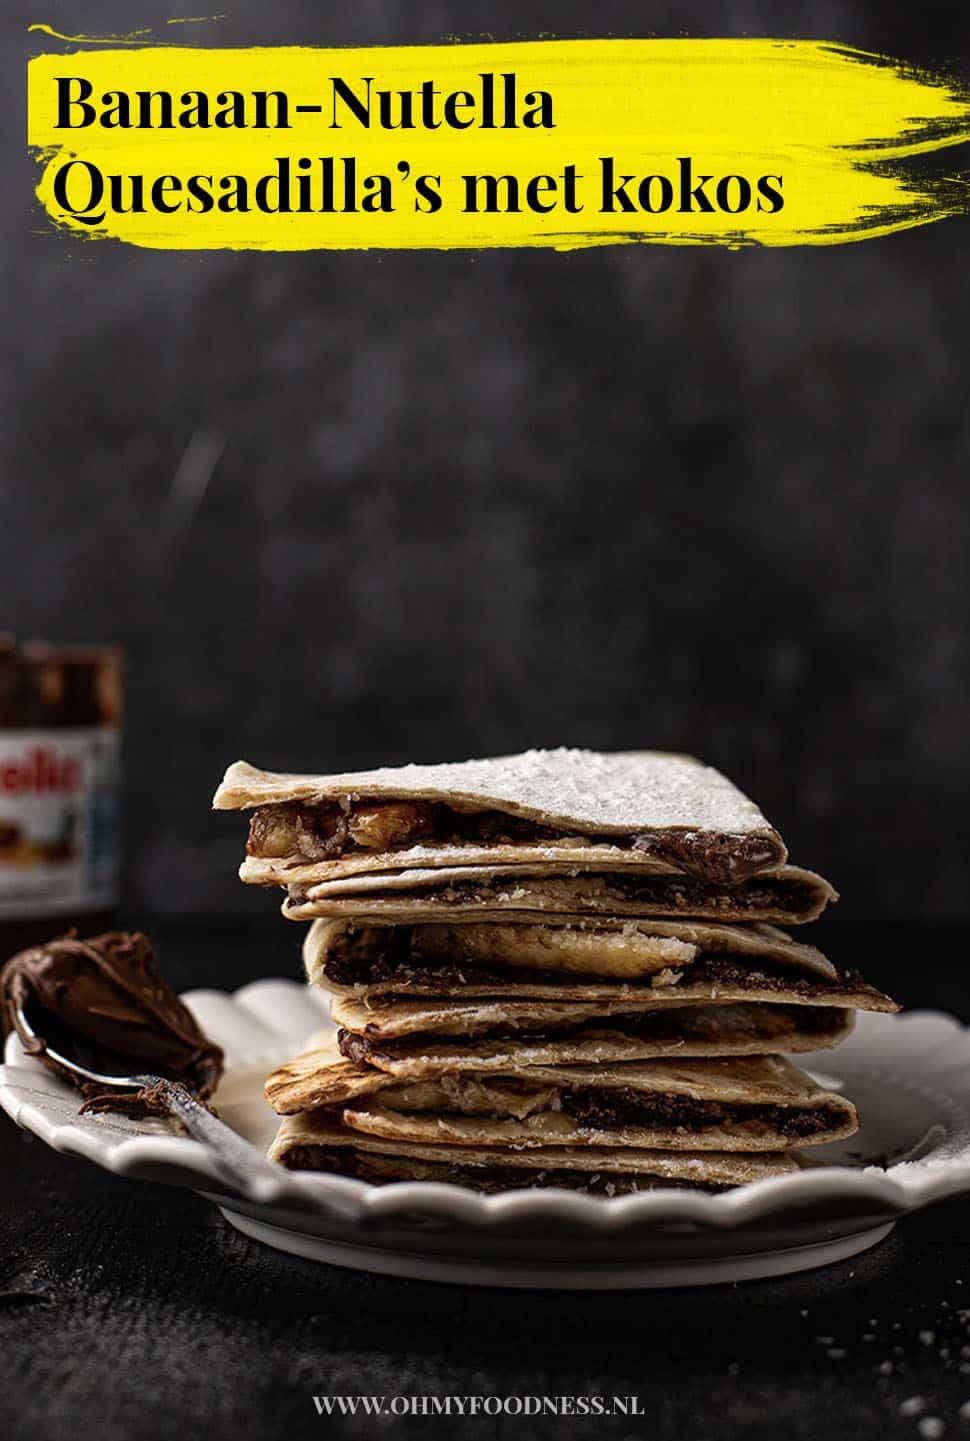 Banaan-Nutella Quesadilla's met kokos